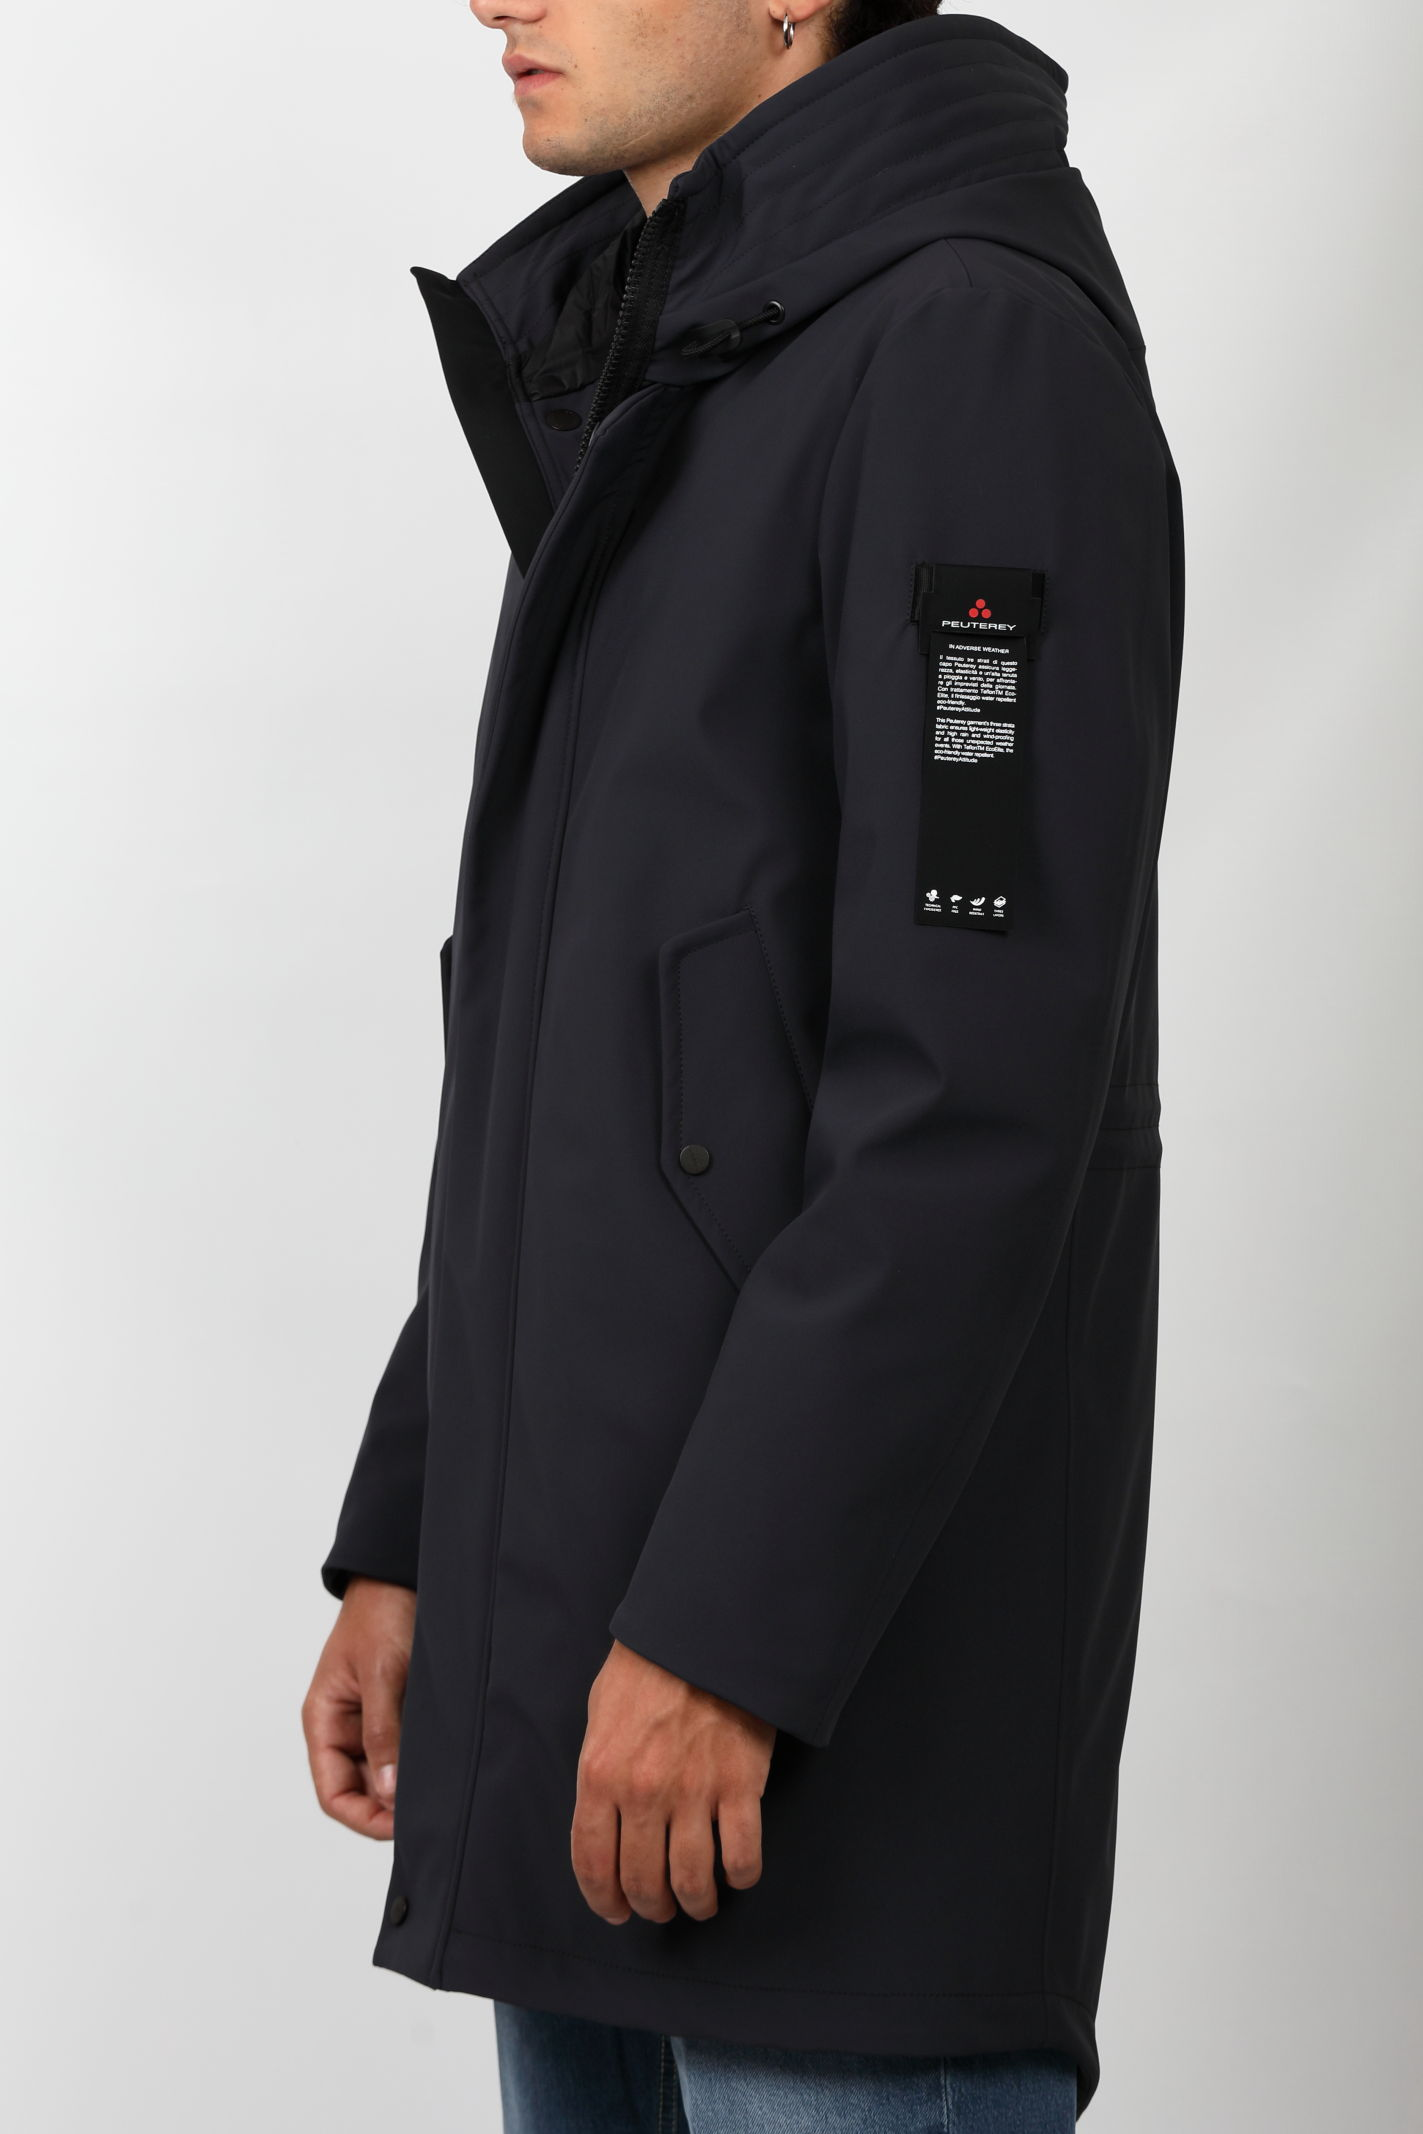 KASA KP PEUTEREY | Outerwear | PEU4113215